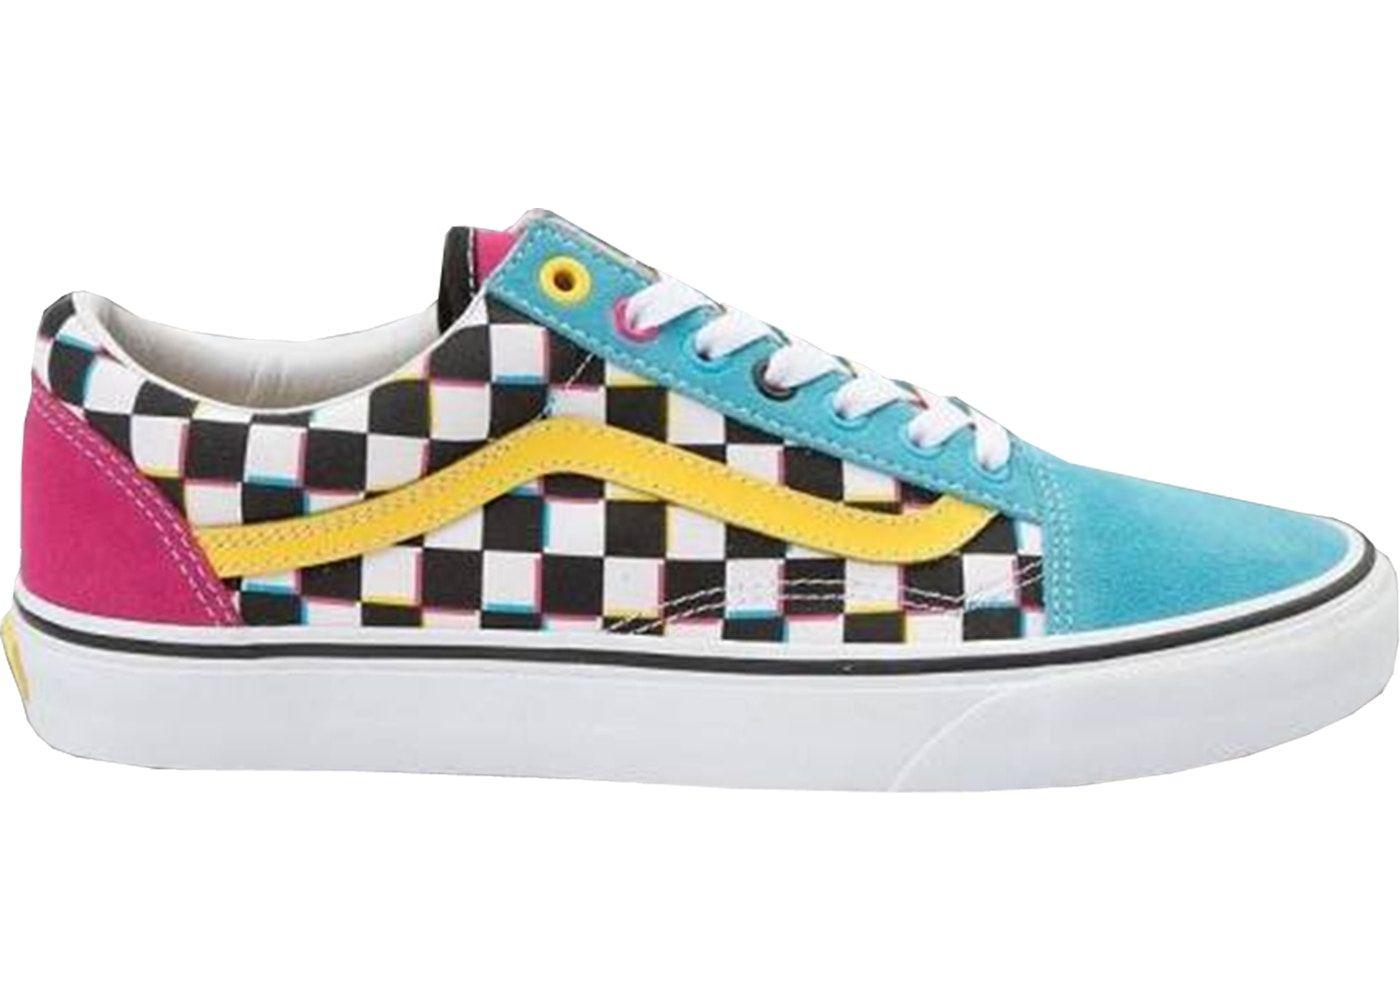 Vans Old Skool Crazy Checks Multi | Vans shoes, Sunflower